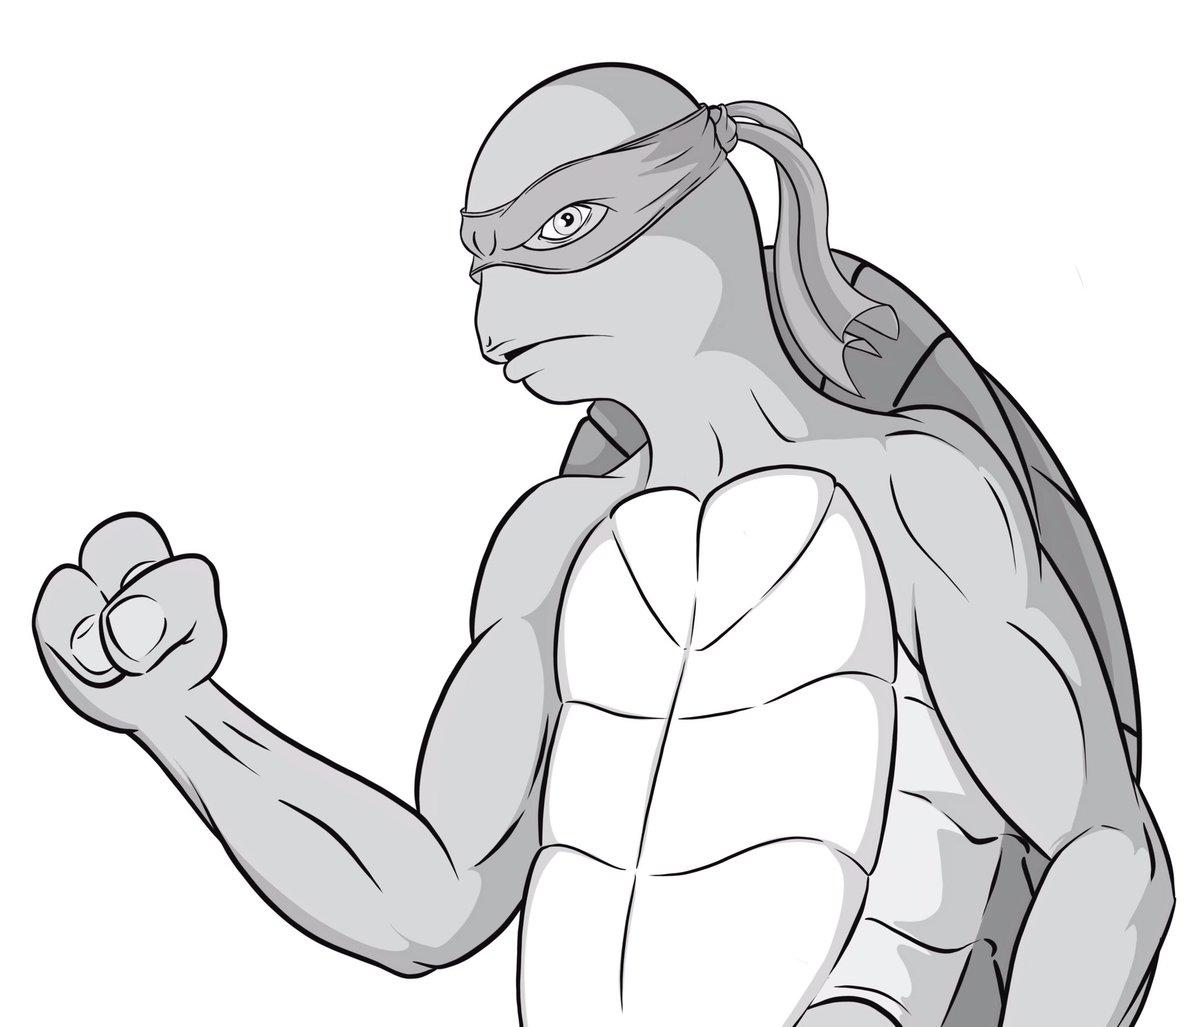 My take on Donatello. @TMNT #fanart<br>http://pic.twitter.com/NUAgDKeU0w